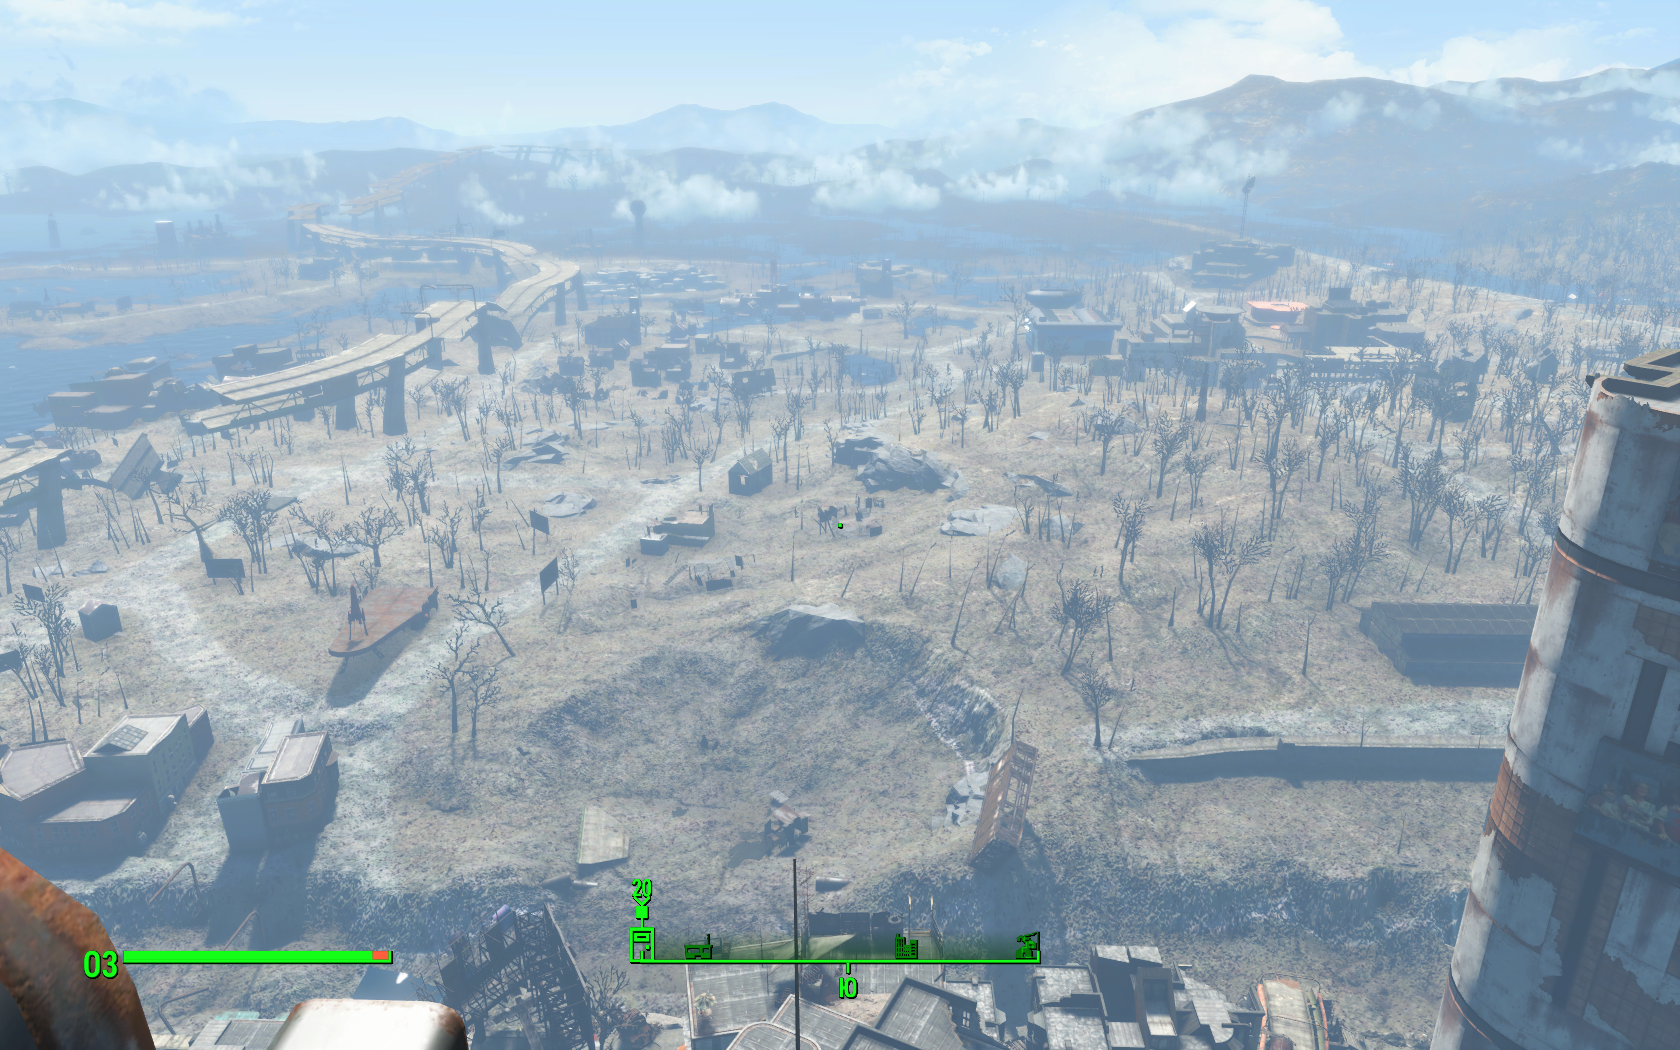 Тринити-тауэр - Вид с вершины - Юг - Fallout 4 Панорама, тауэр, Тринити, Тринити-тауэр